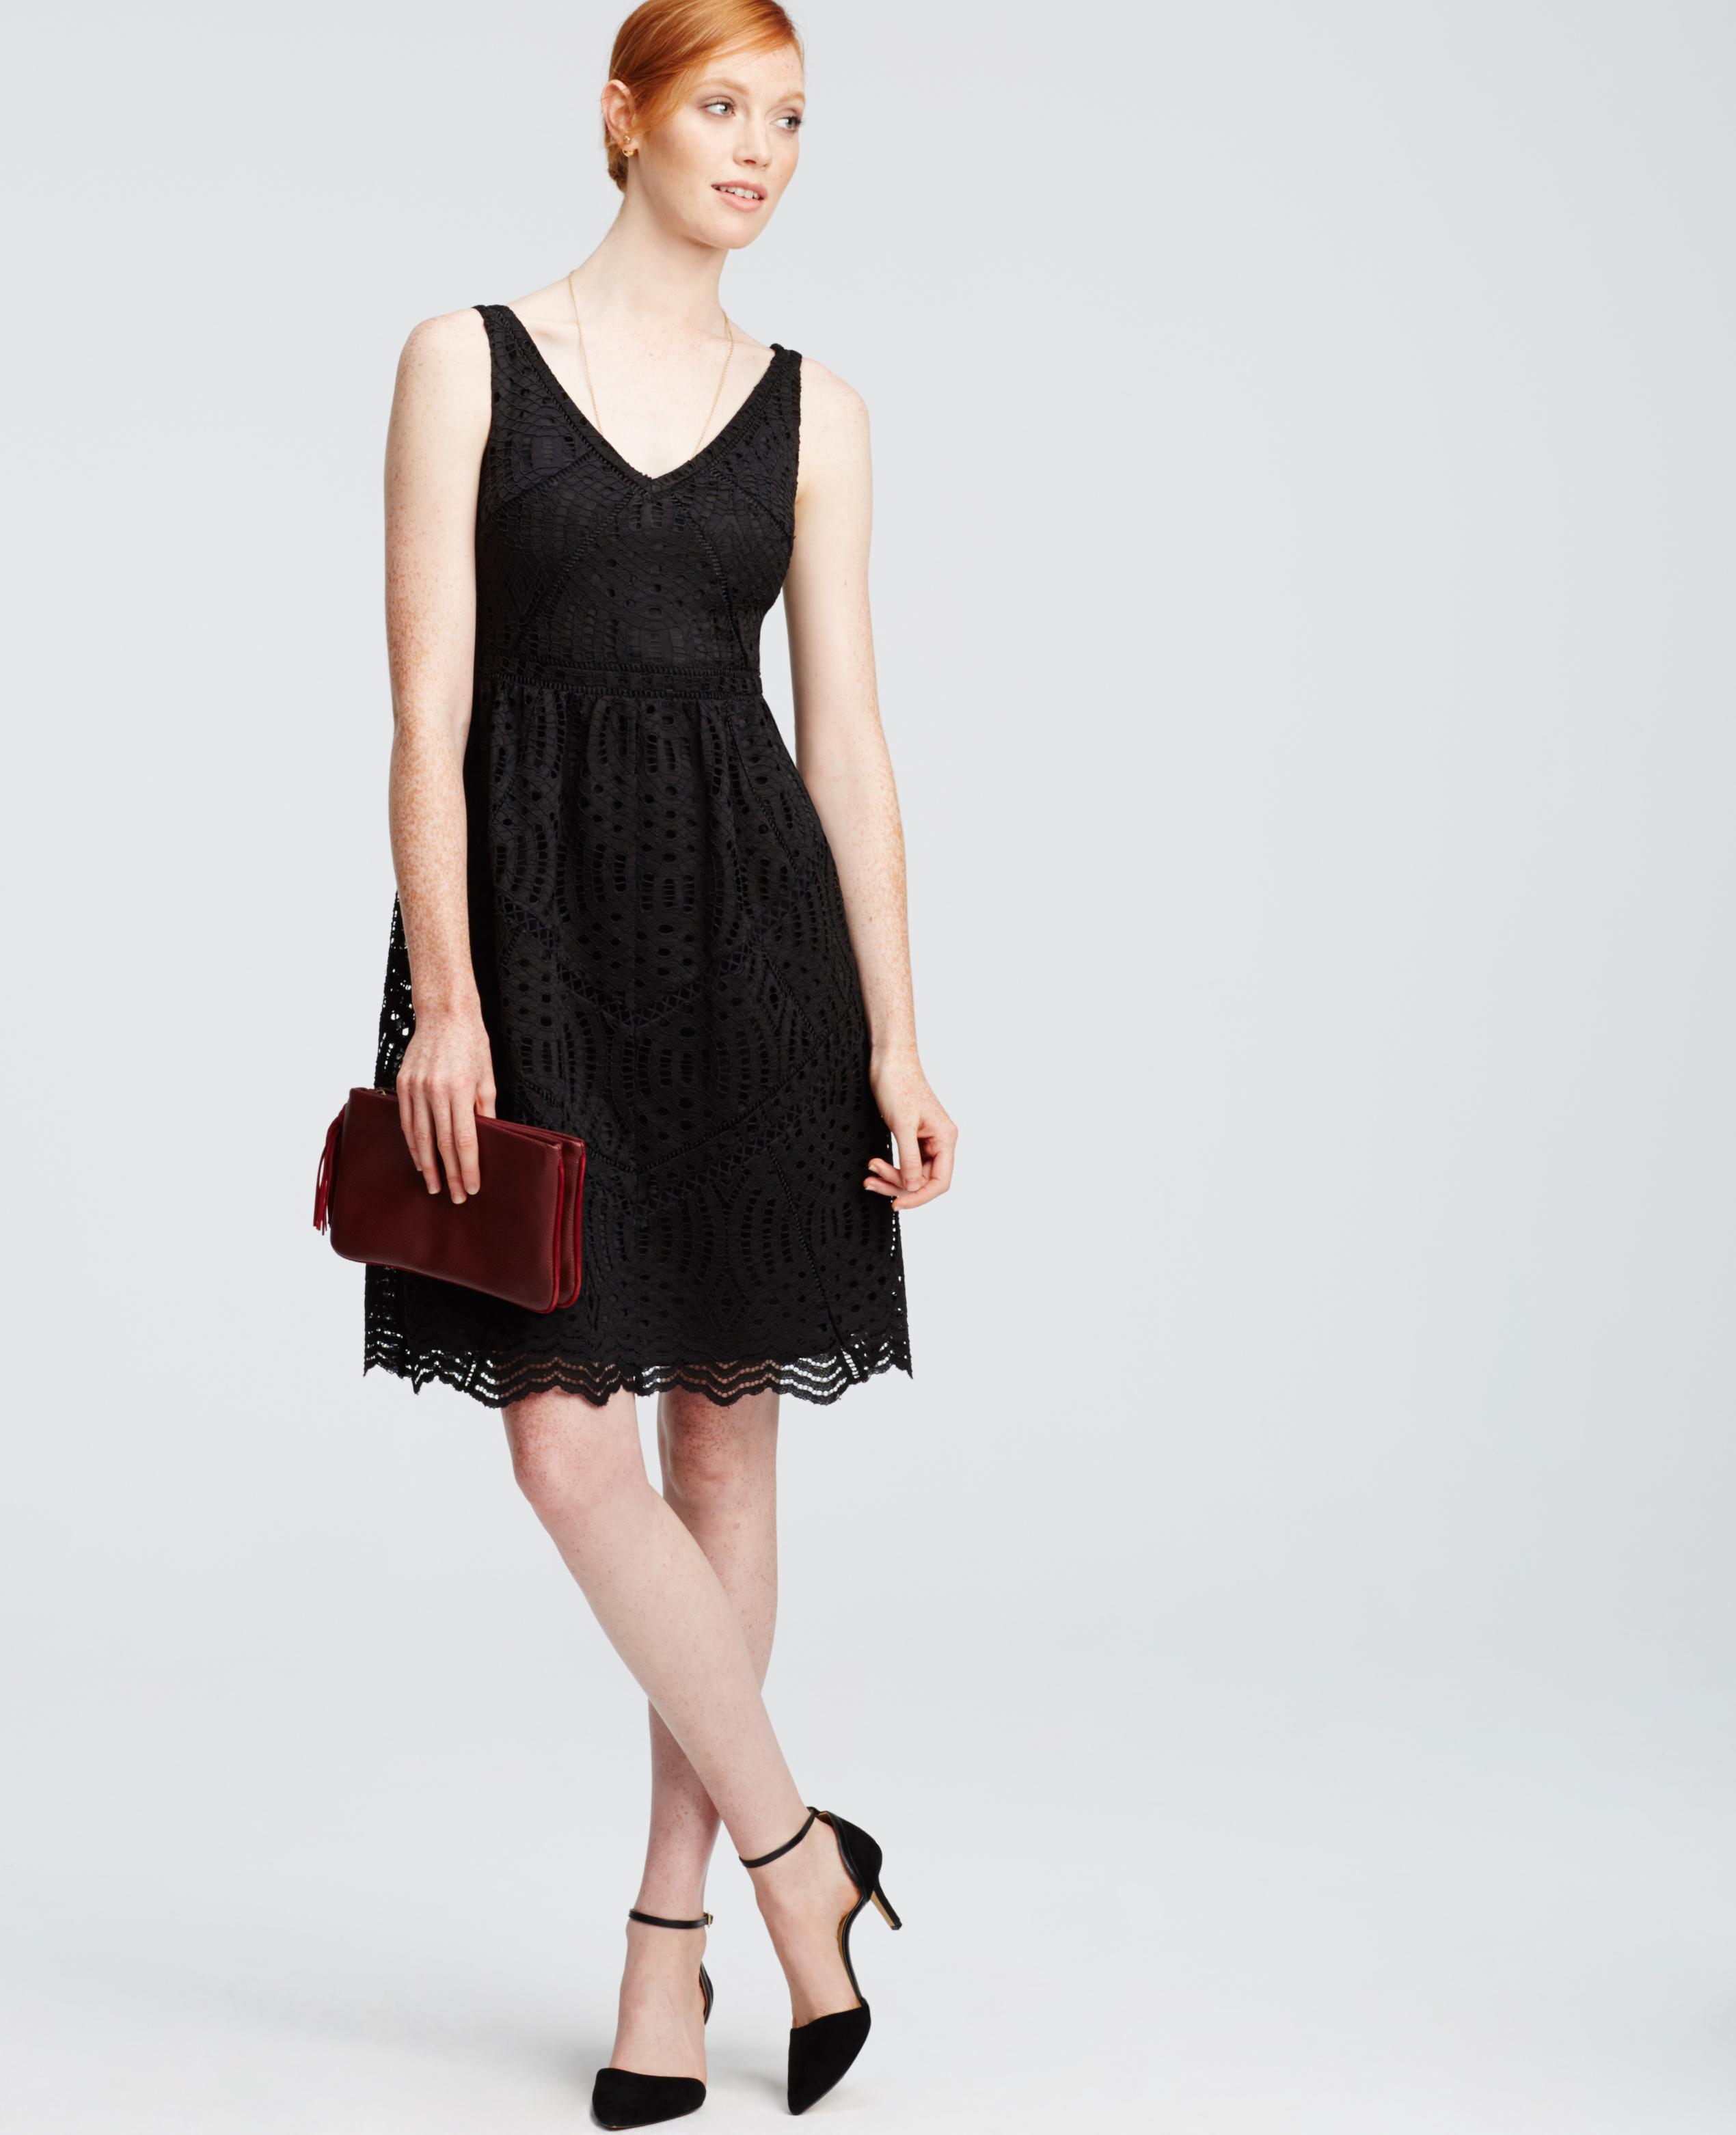 Lyst - Ann Taylor Petite Lace Flare Dress in Black